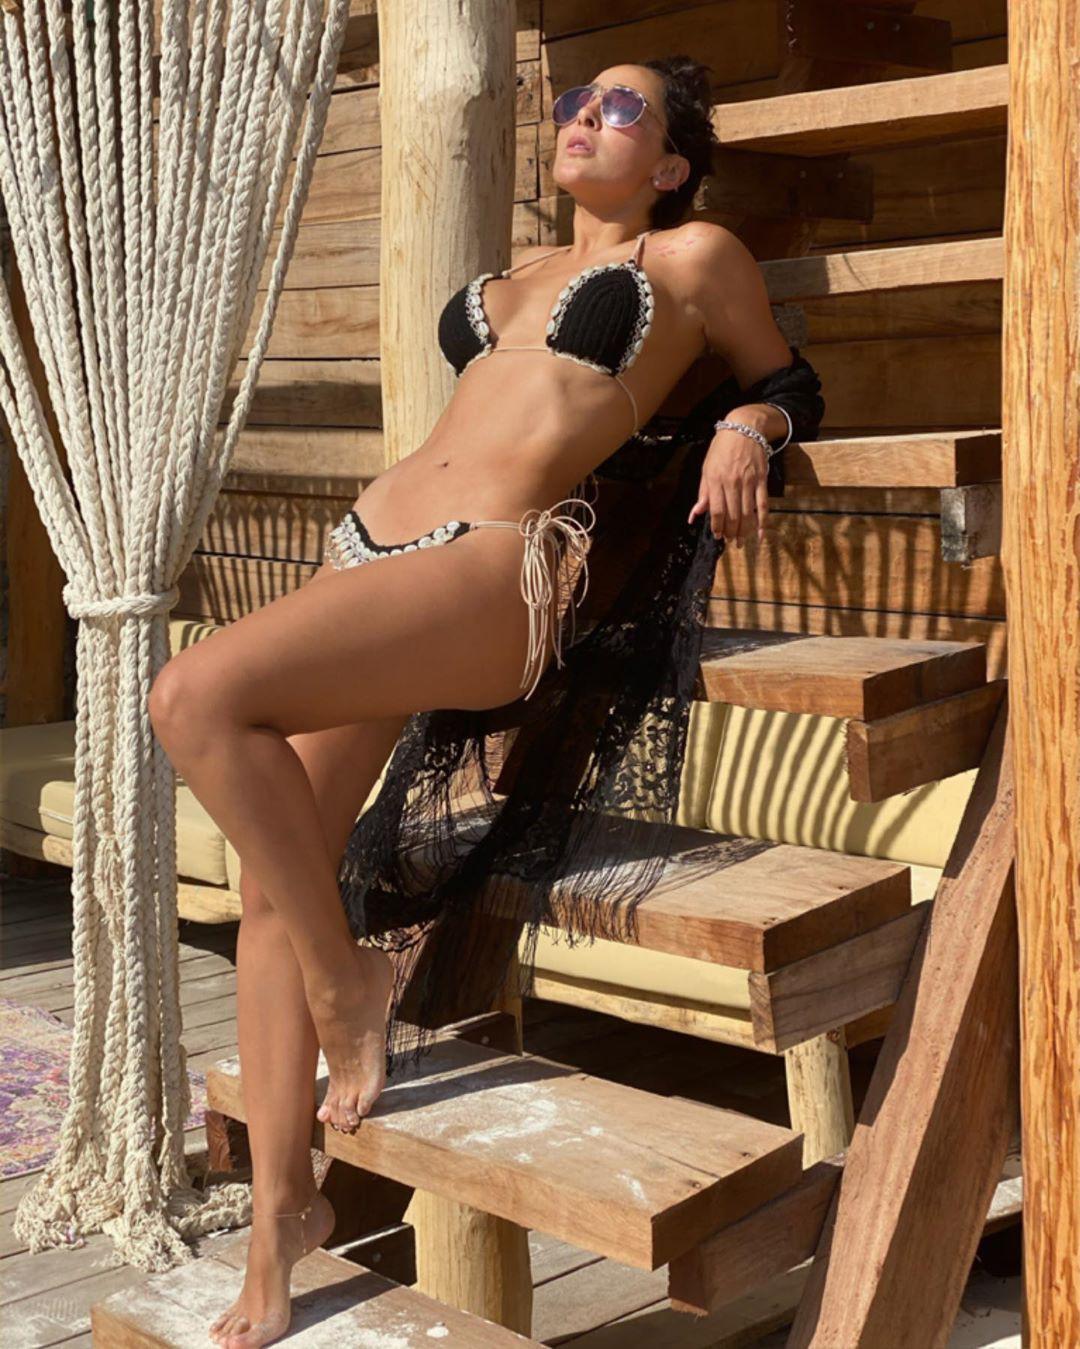 Manelyk Gonzalez hot thighs, legs photo, hot body